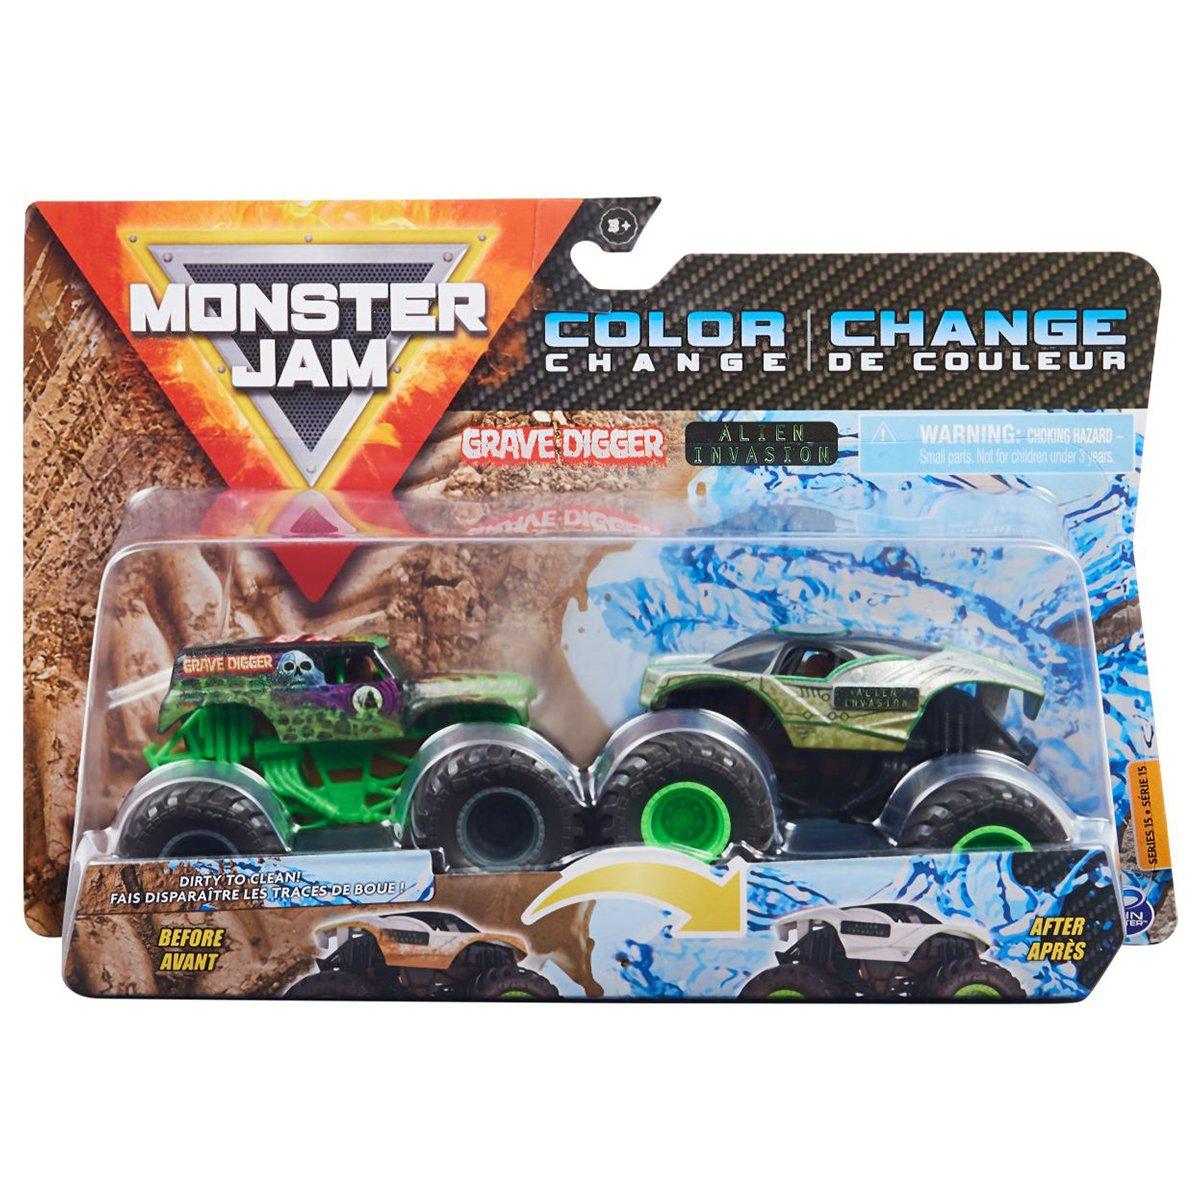 Set 2 masini Monster Jam, Scara 1:64, Grave Digger & Alien Invasion